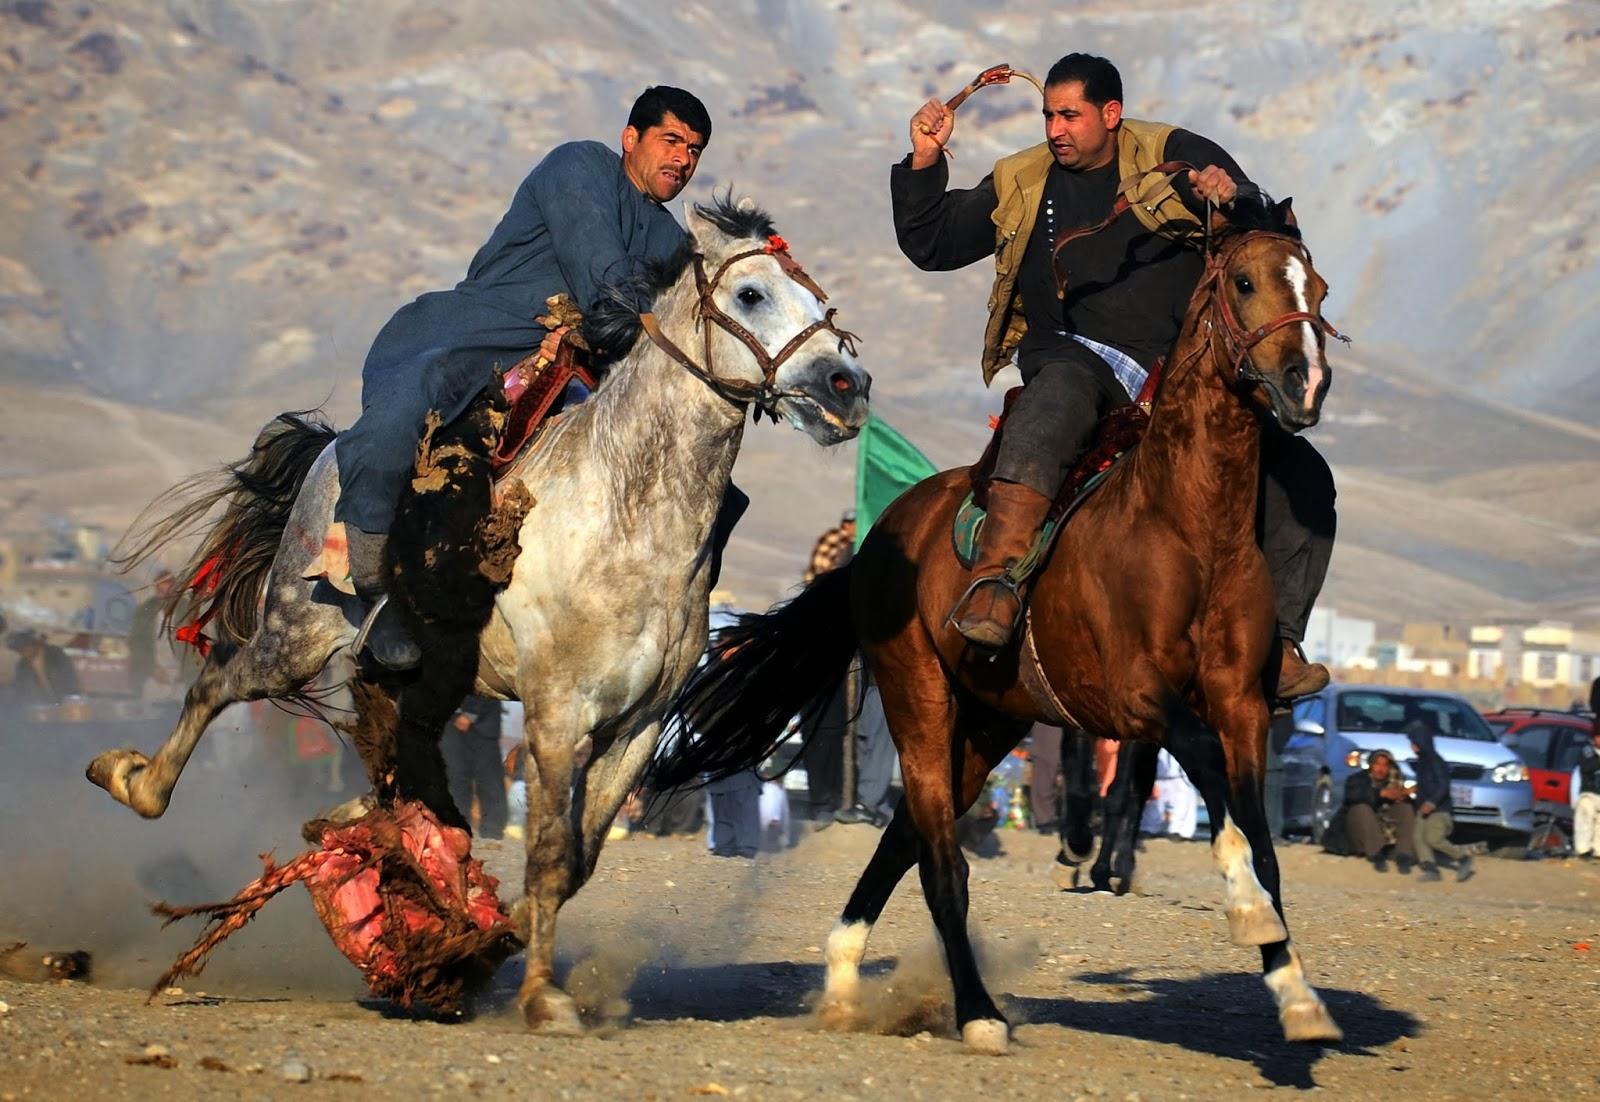 Afghanistan, National, Sports, Buzkashi, Game, Tradition, Herat, Horsemen, Horse, Animal, Carcass, Rider,